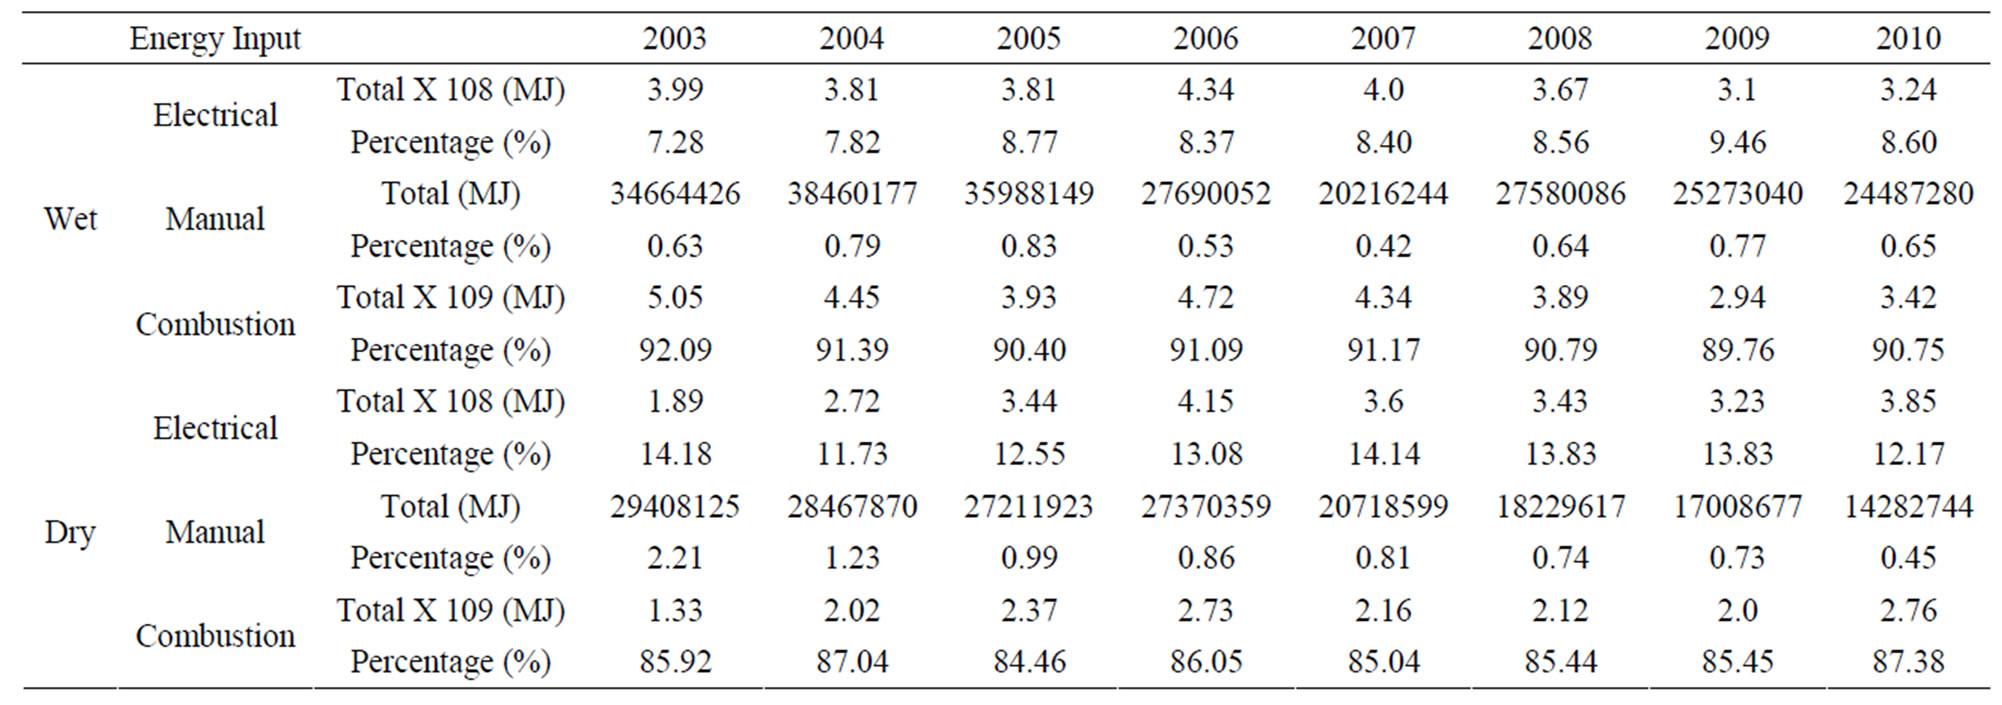 consumption pattern in nigeria The consumption response to income changes tullio jappelli1 and luigi pistaferri2 1department of economics, university of naples federico ii, 80126 naples, italy.